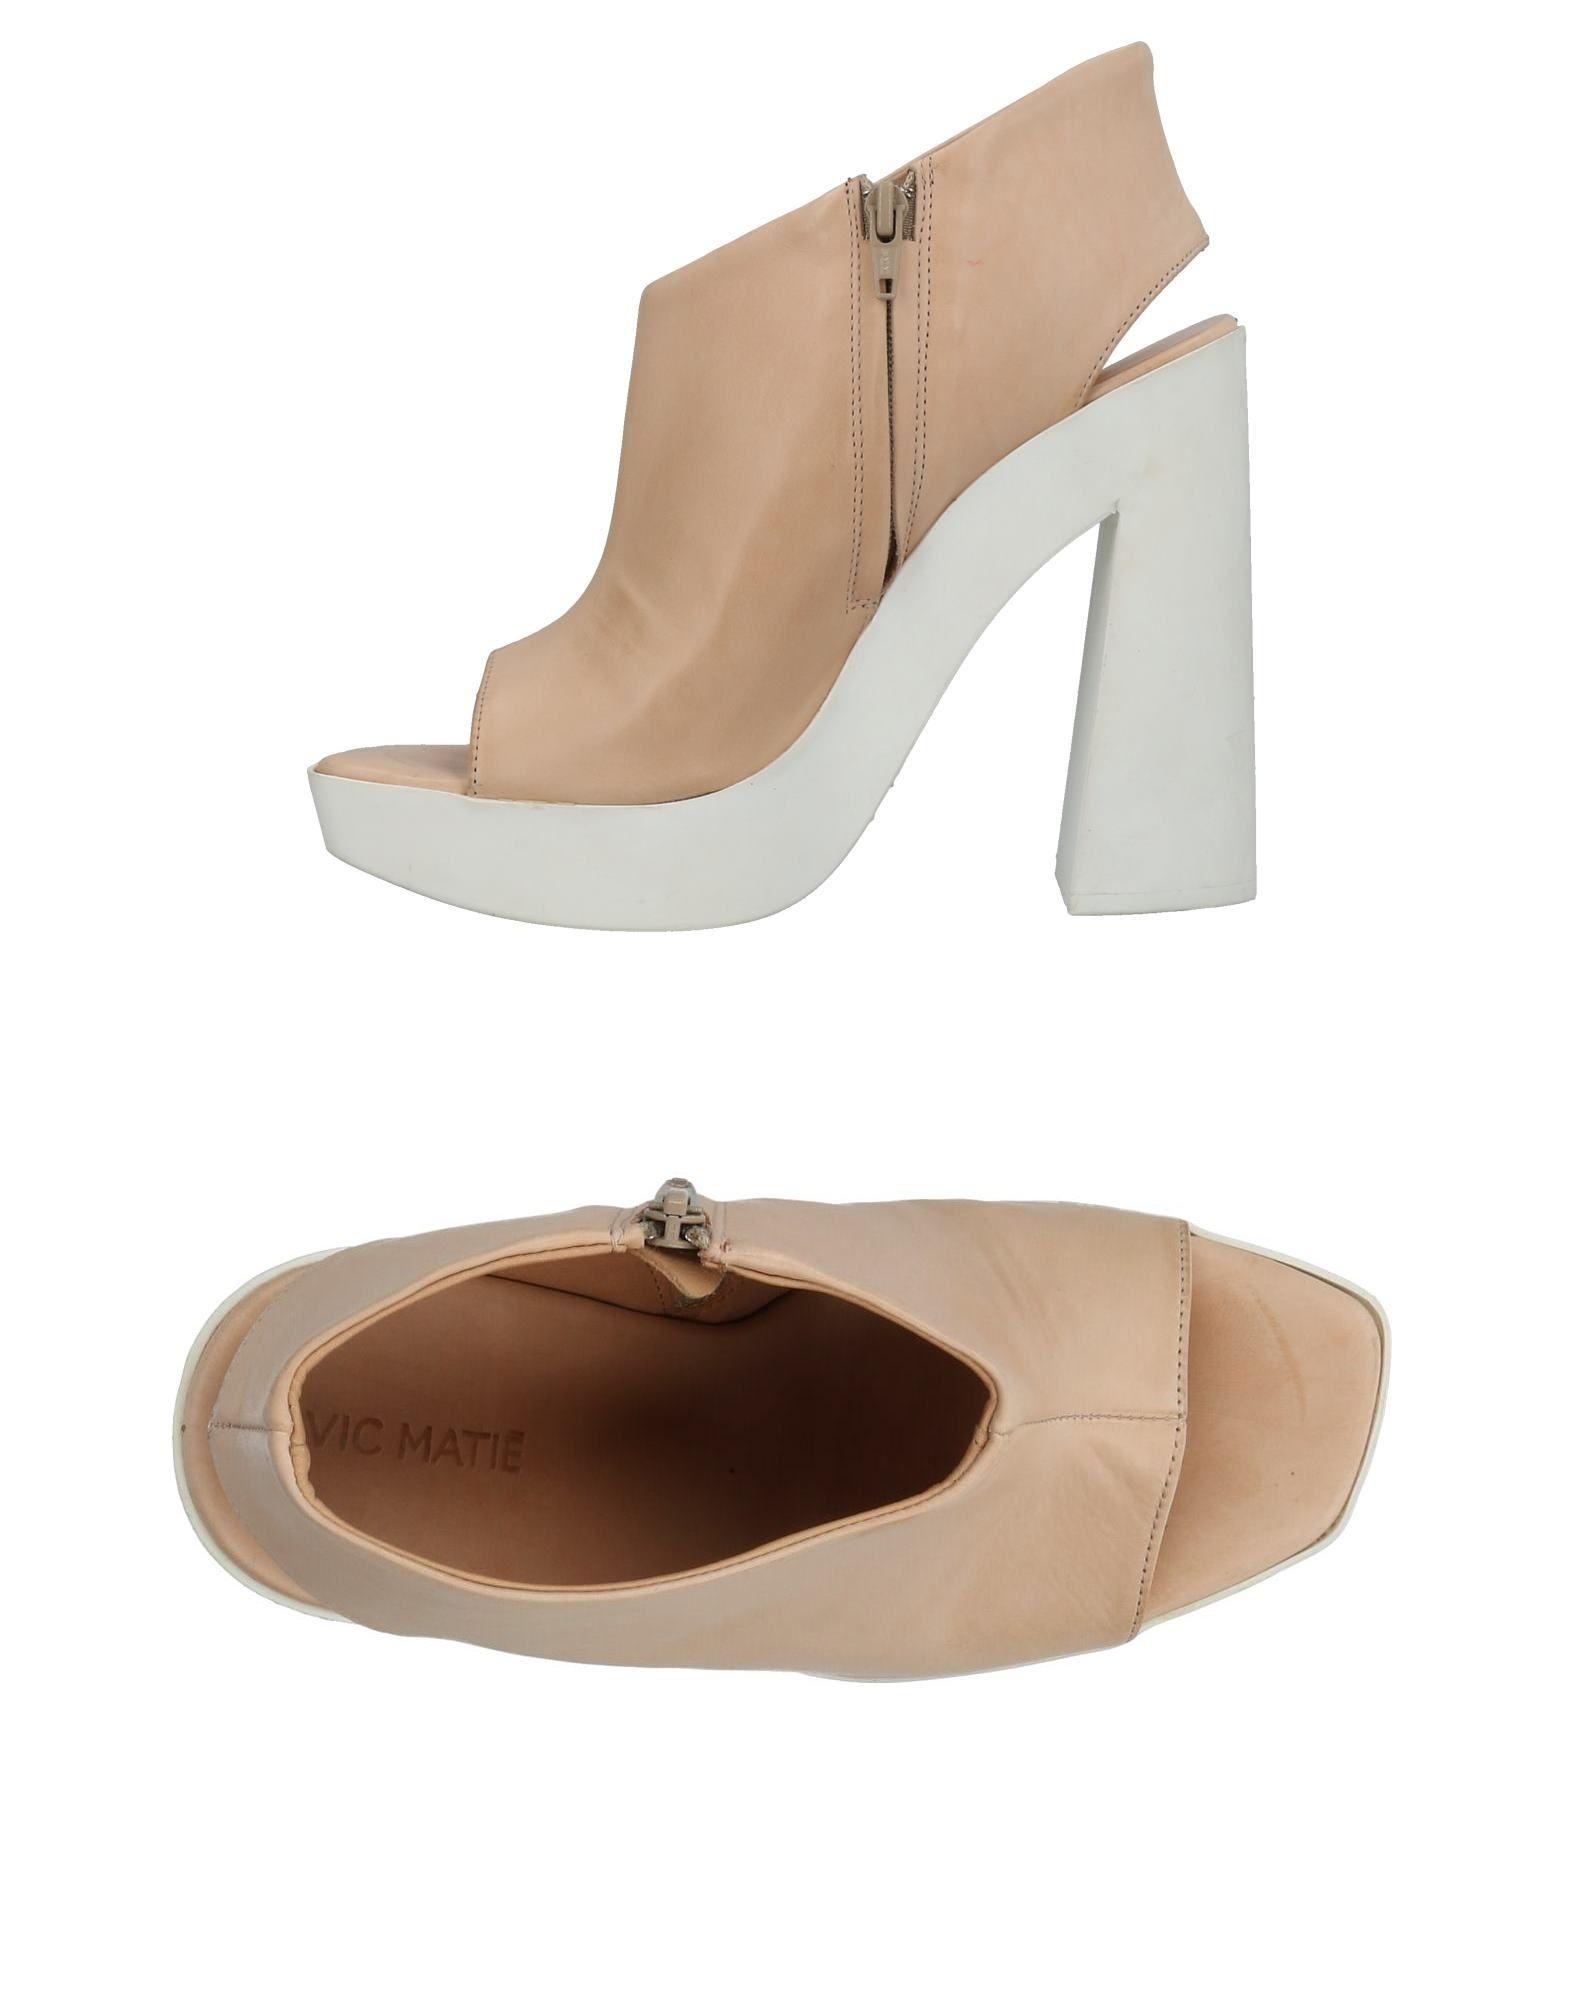 Stilvolle billige Schuhe Damen Vic Matiē Sandalen Damen Schuhe  11431164AE 7e5a80